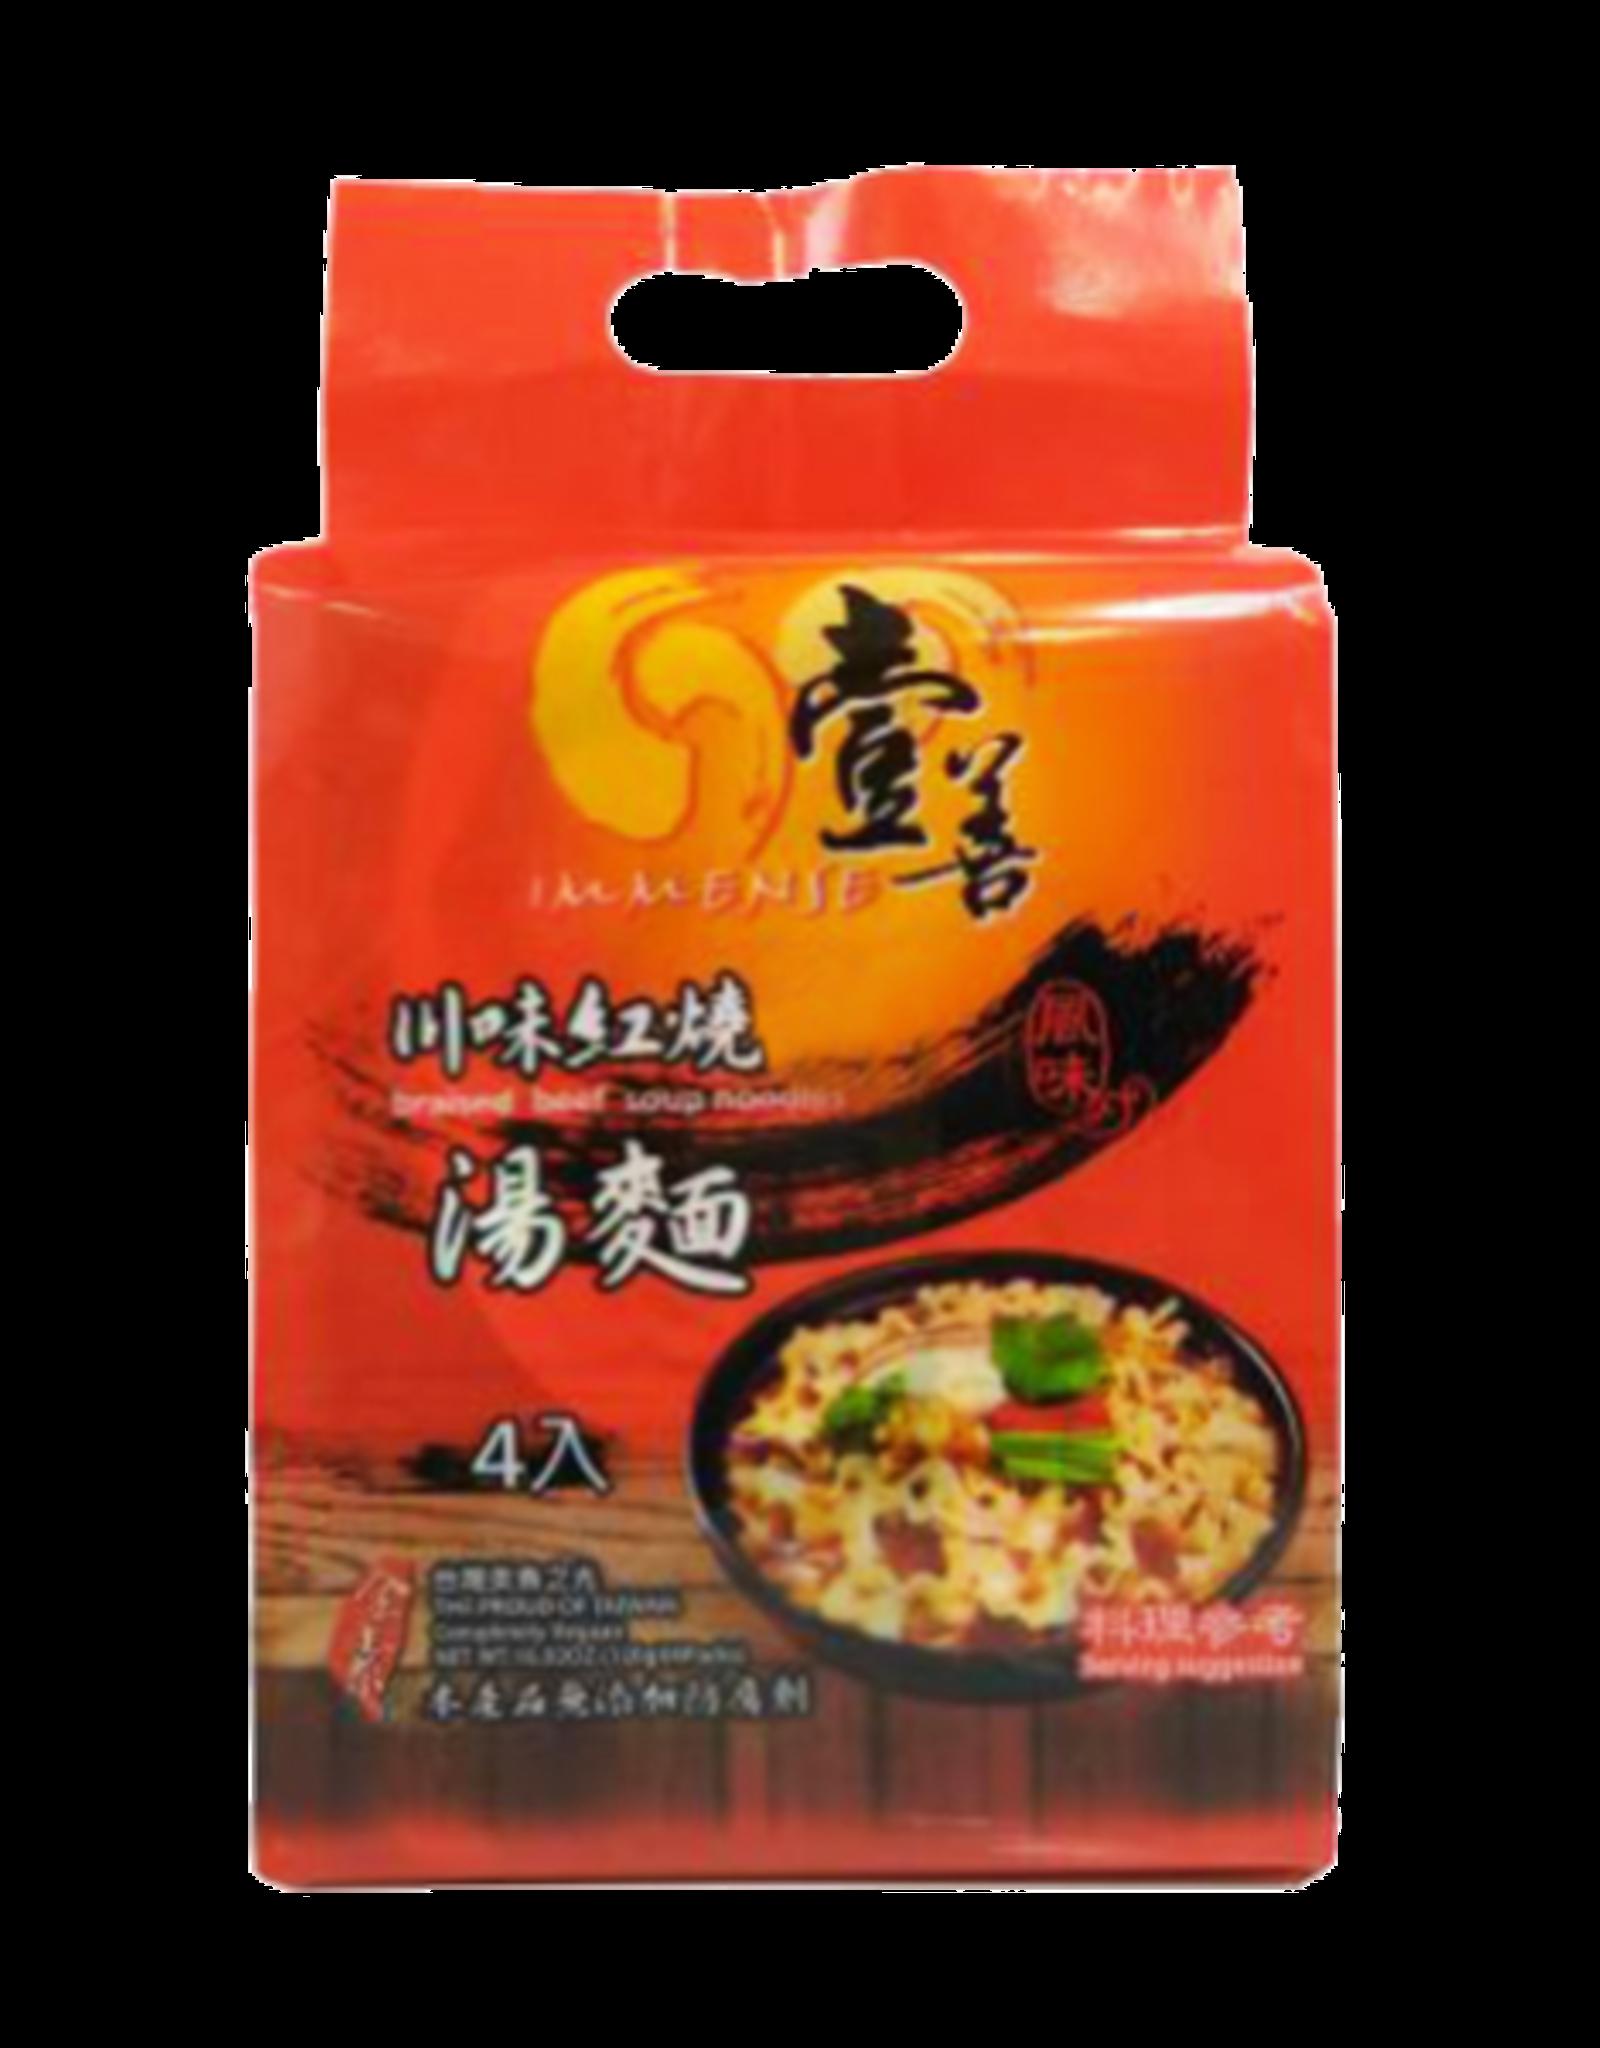 Immense * 壹善 (HI) Vegan Sichuan Braised Beef Soup Noodles*(壹善) 川味紅燒湯麵